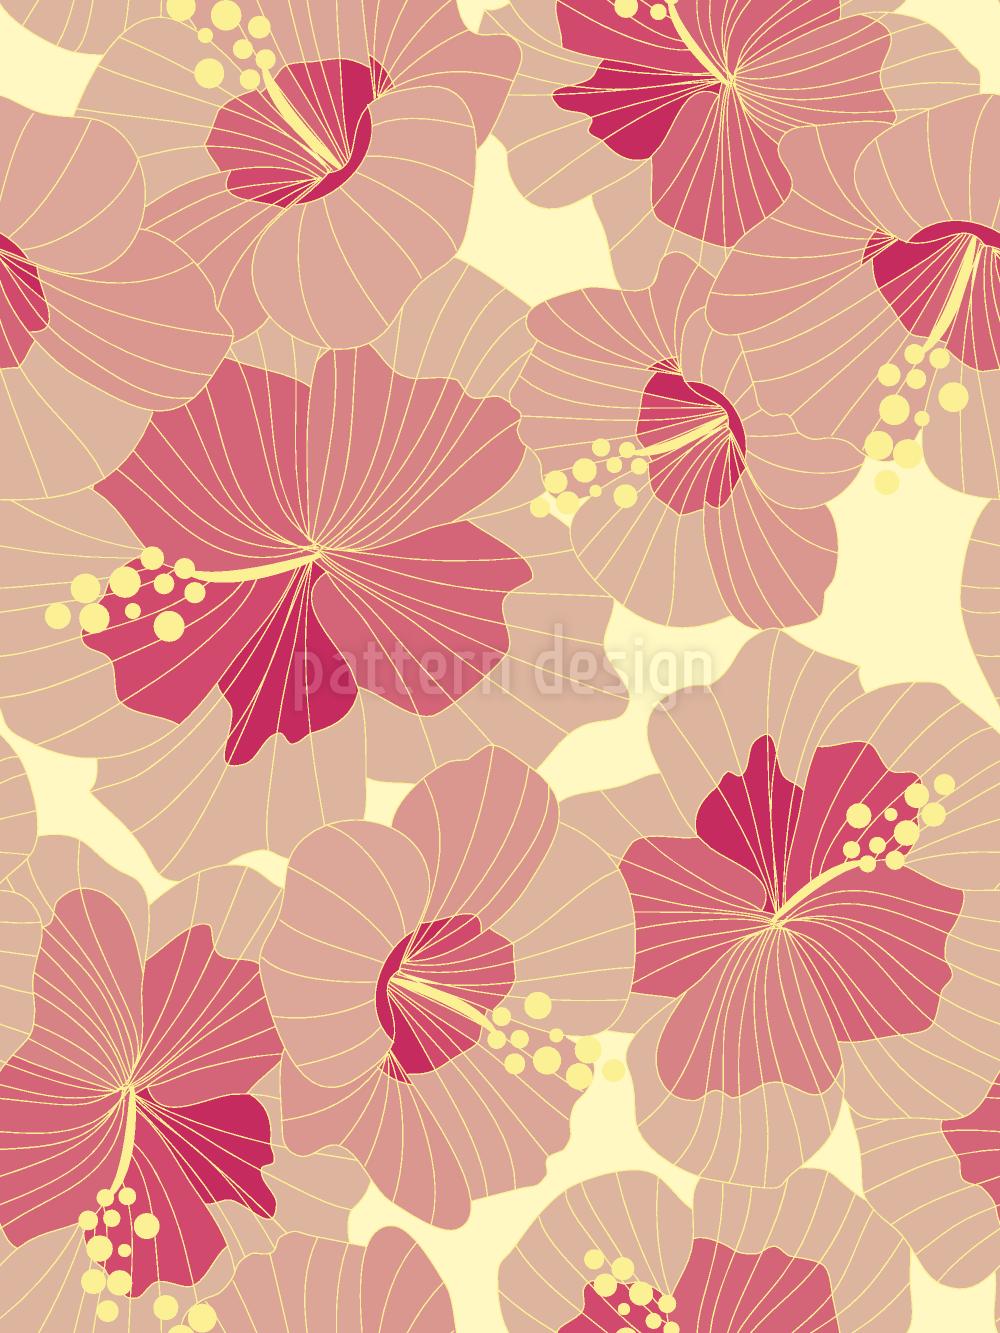 Ruby Design Patterns Custom Design